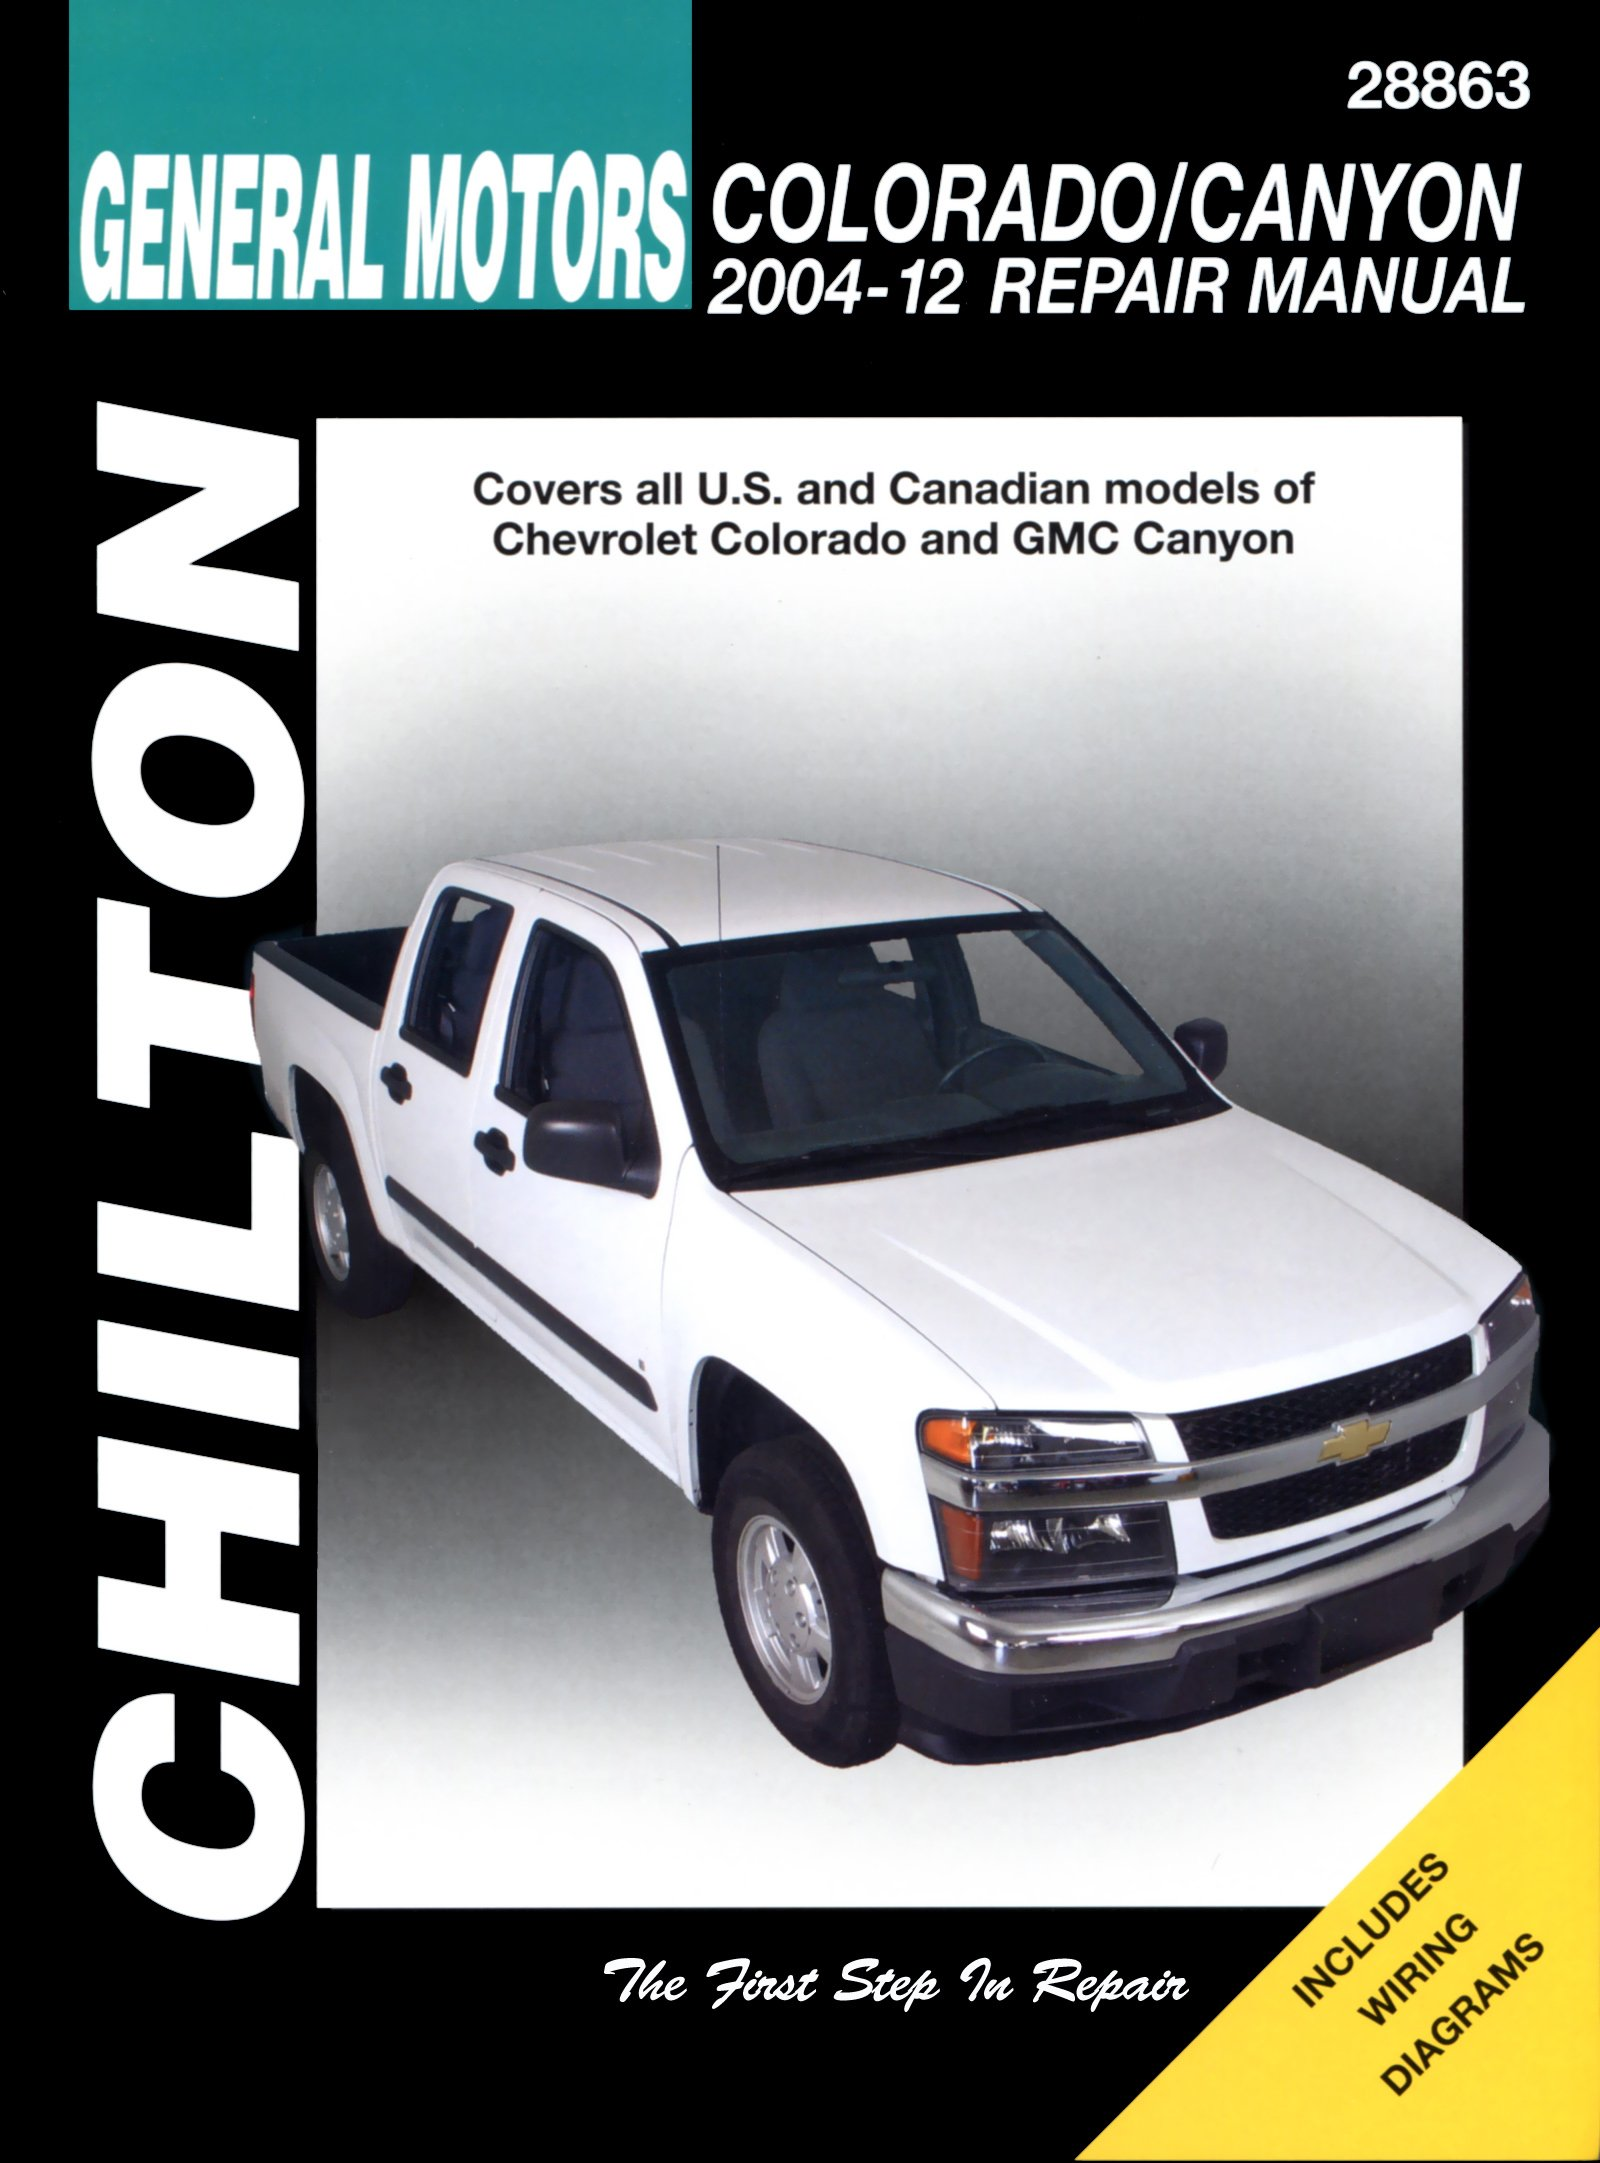 Chilton repair manual discount code pdf download oukasfo silveradosierracom downloads fandeluxe Gallery